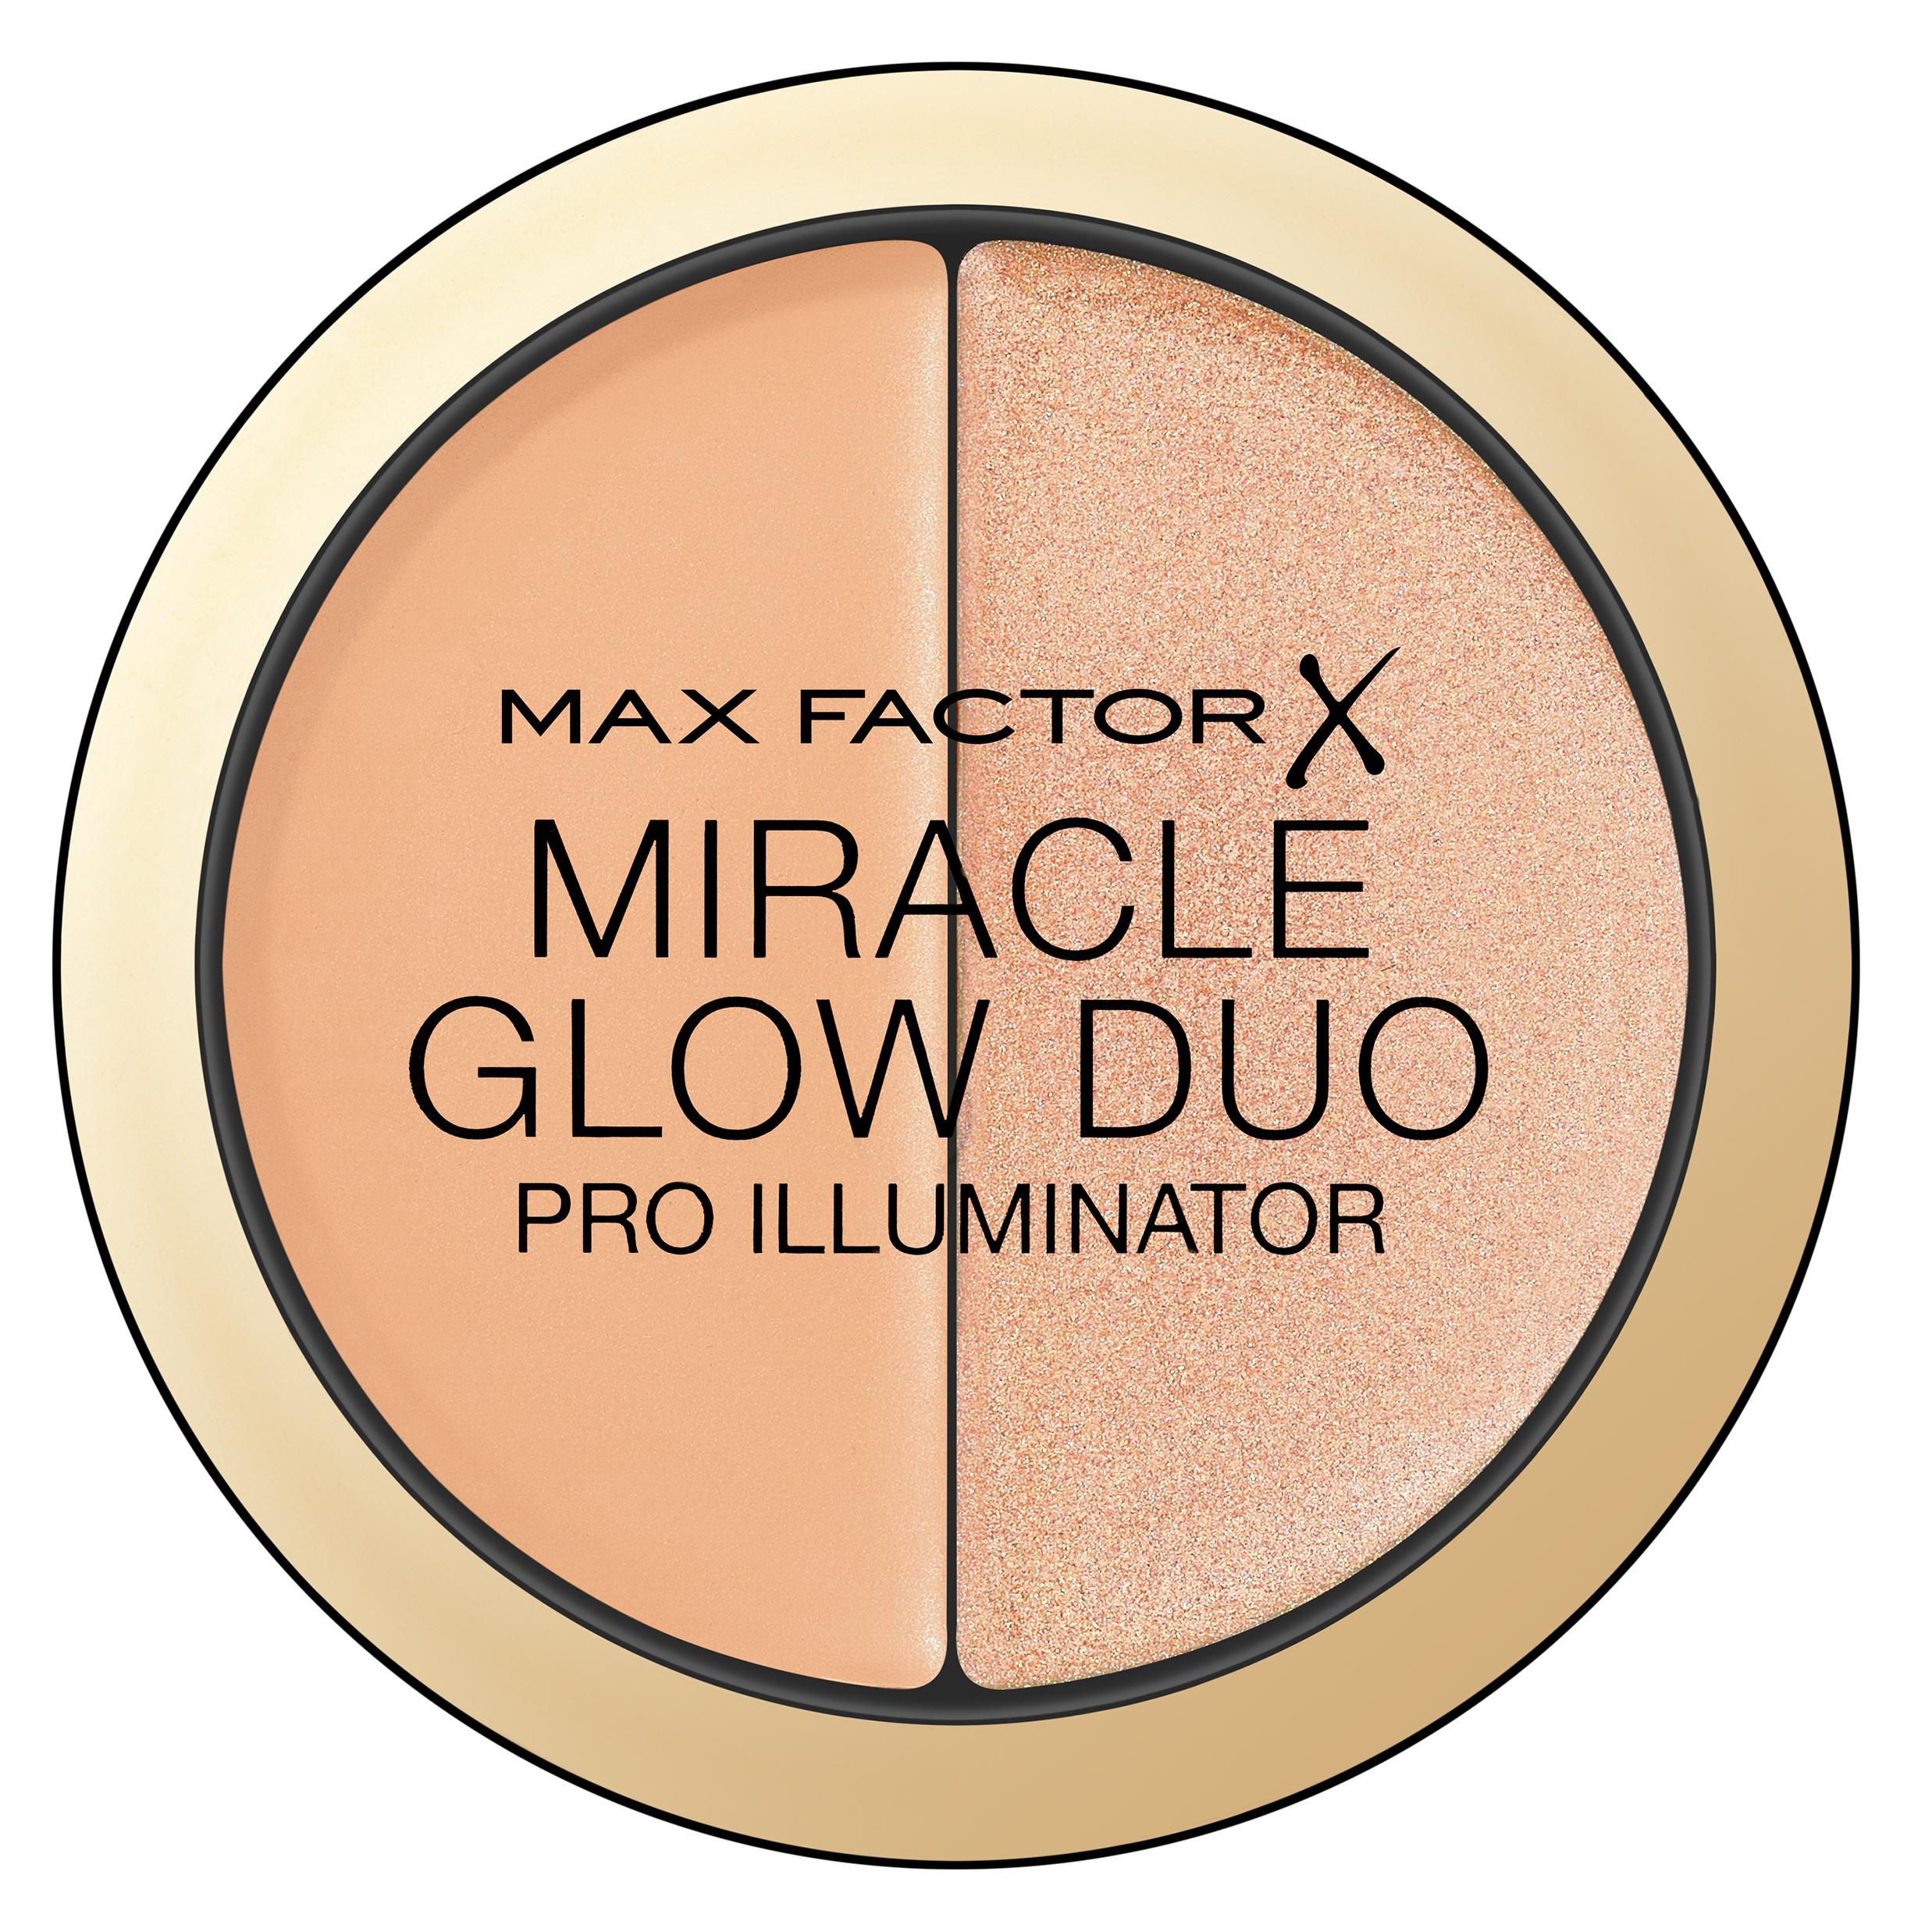 MAX FACTOR Хайлайтер 20 / Miracle Glow Duo medium